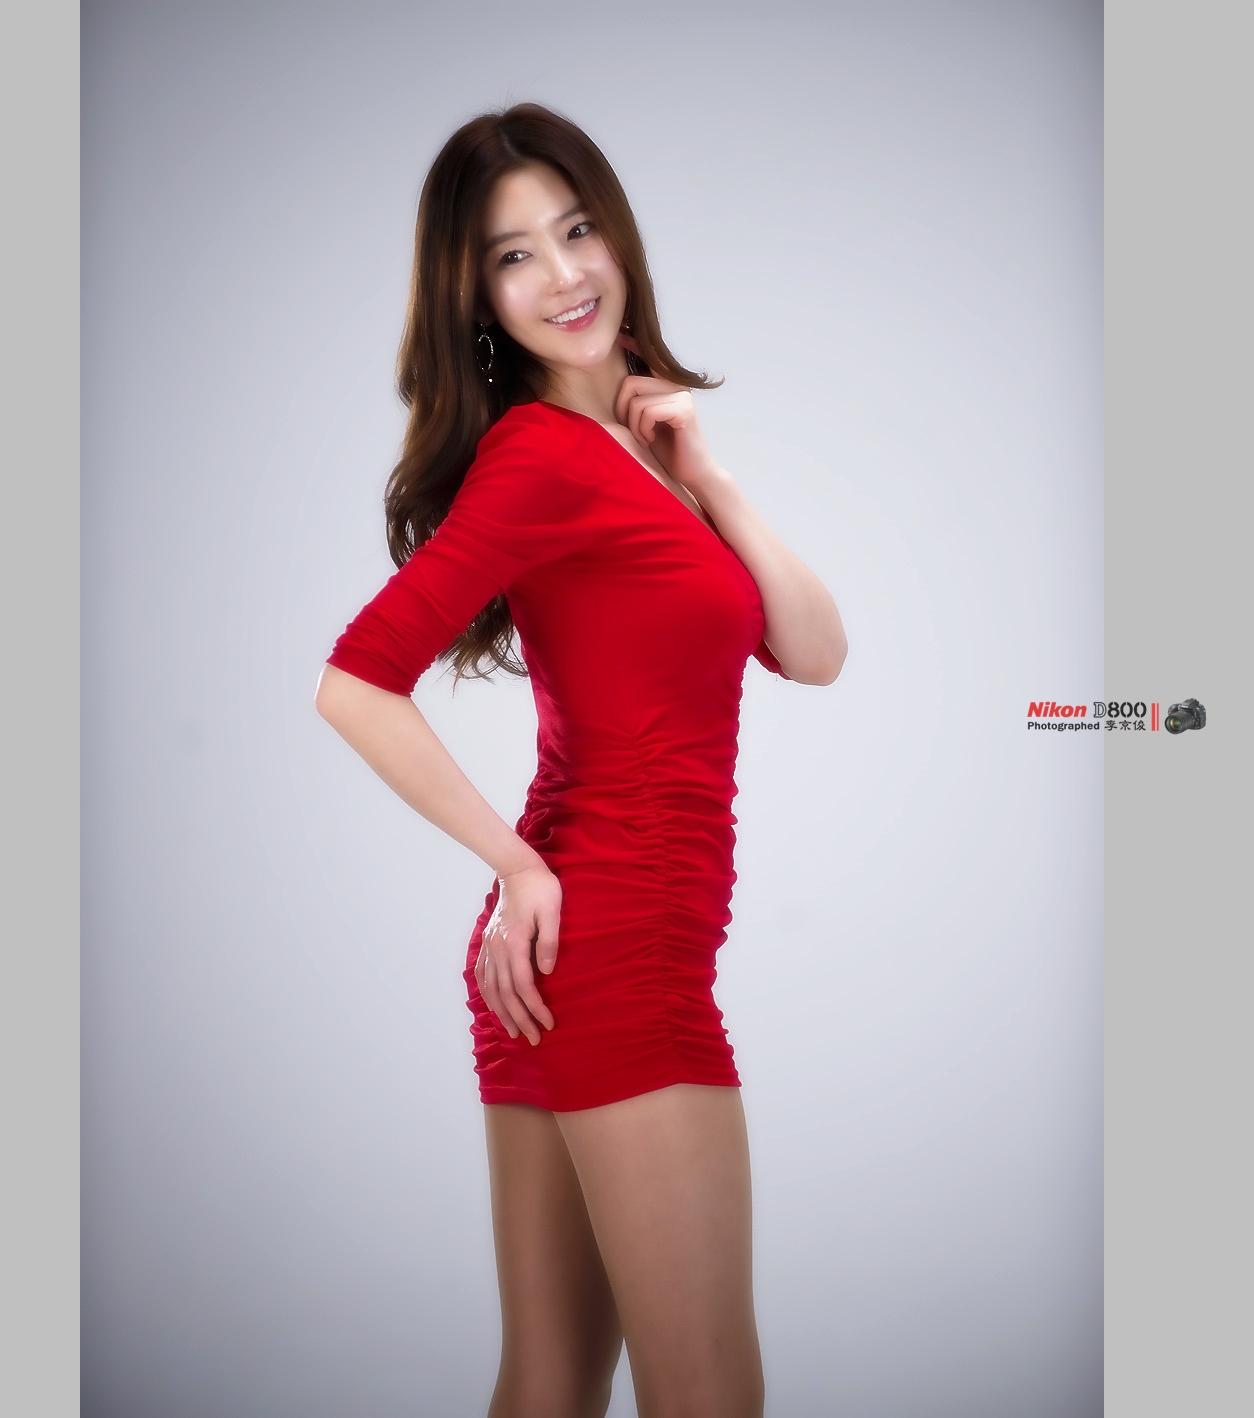 Young Kim Yoo Yeon nude (15 photo), Sexy, Paparazzi, Selfie, cameltoe 2018